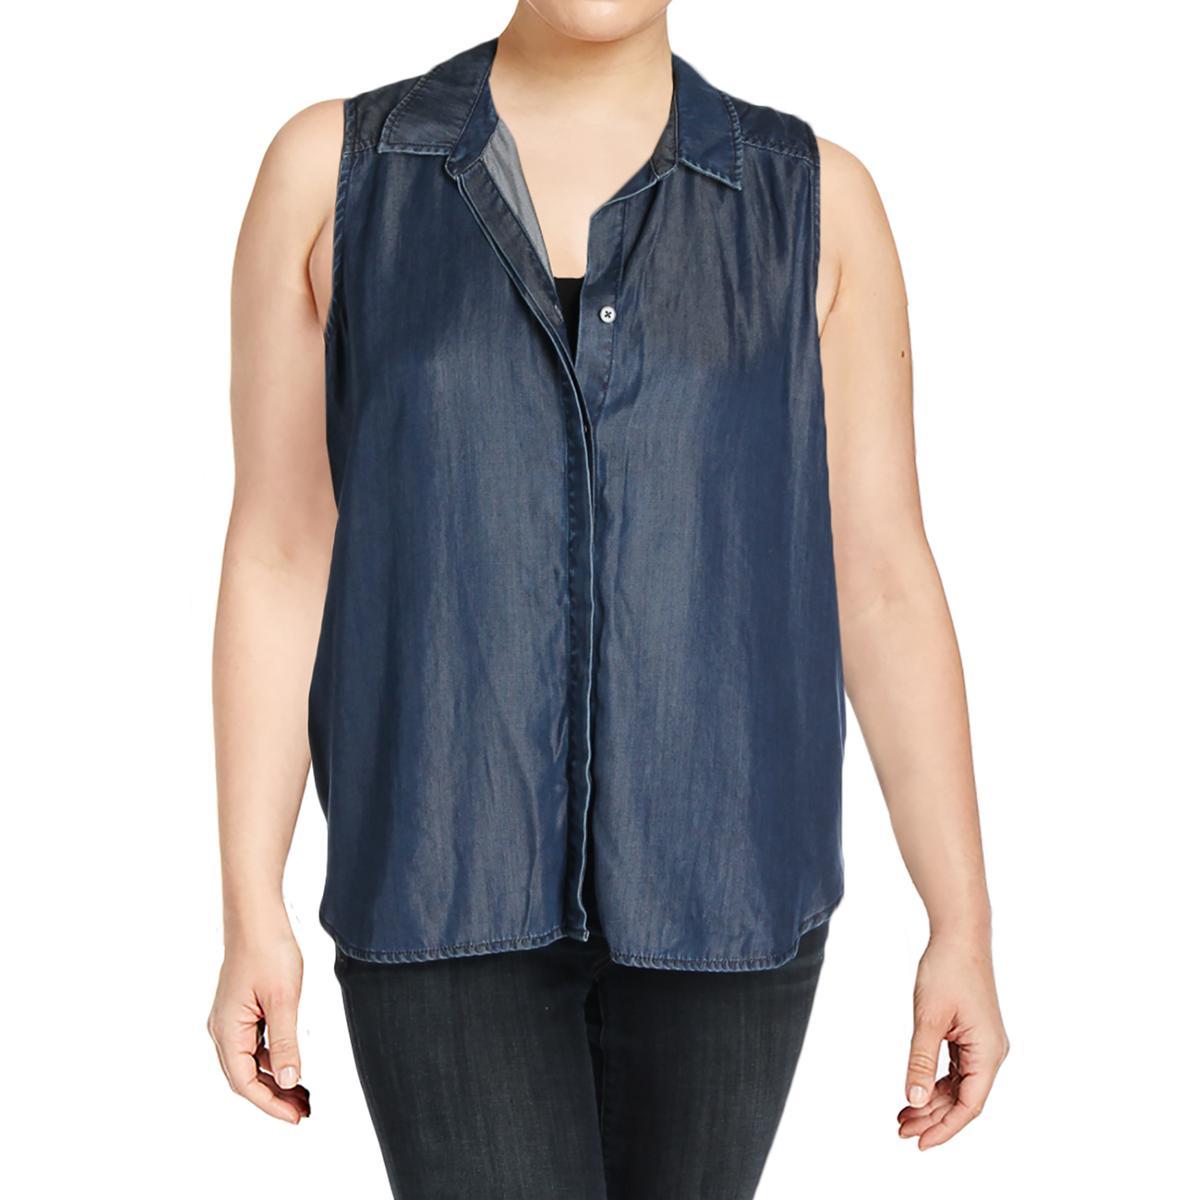 ef714e08fe3b4 Details about NYDJ Womens Vera Denim Sleeveless Blouse Button-Down Top Shirt  BHFO 2422